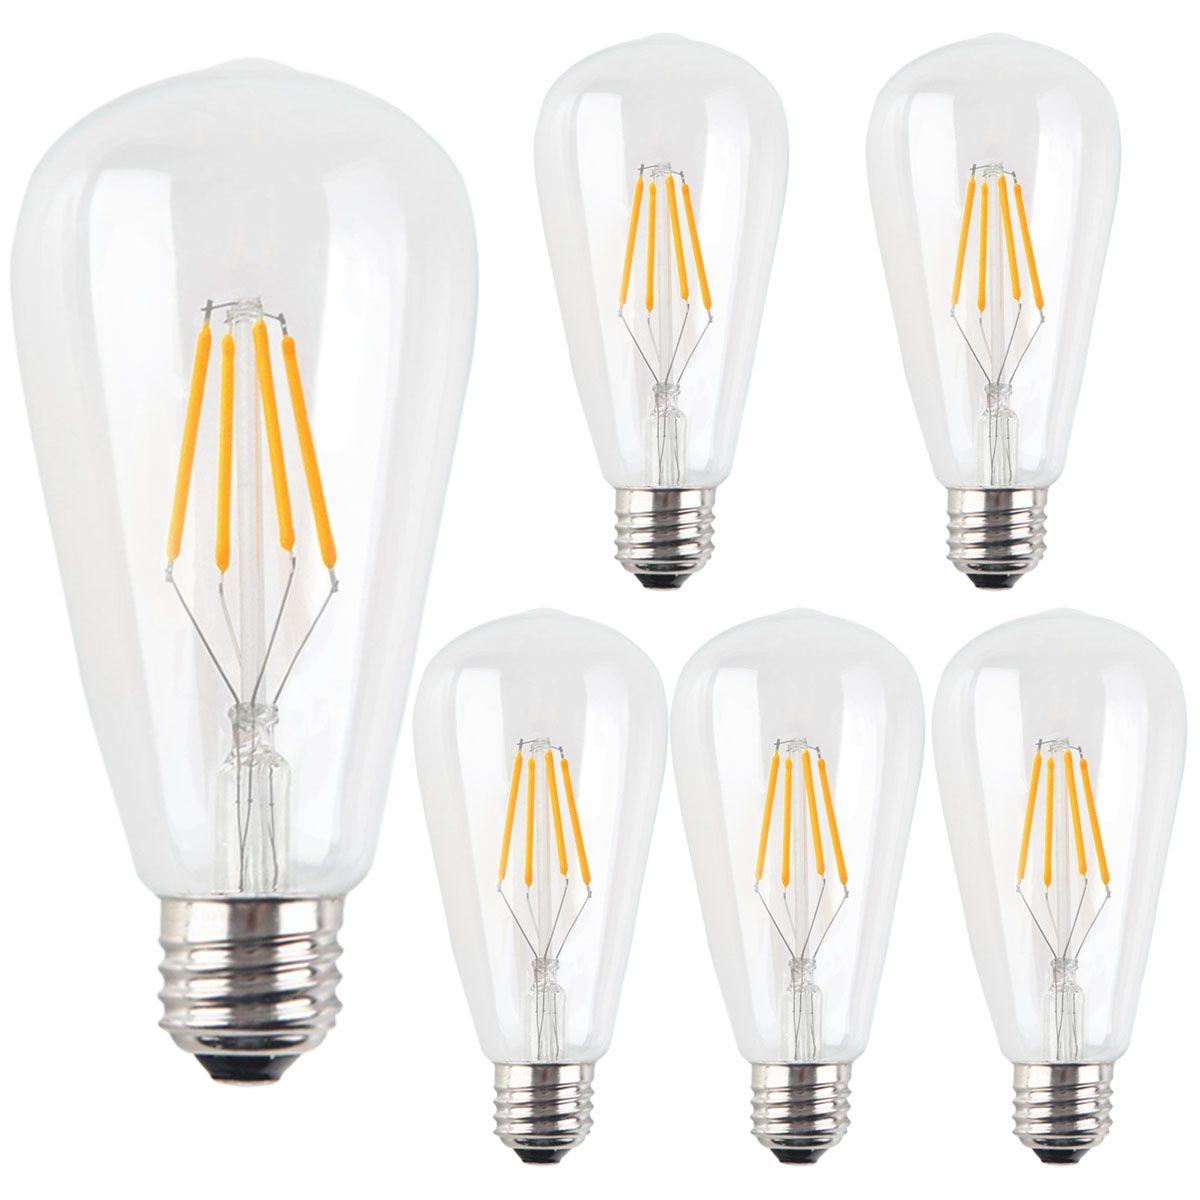 Santaro ST64 4W LED Bulb Edison Vintage E26 110V for US | LED Bulb ...